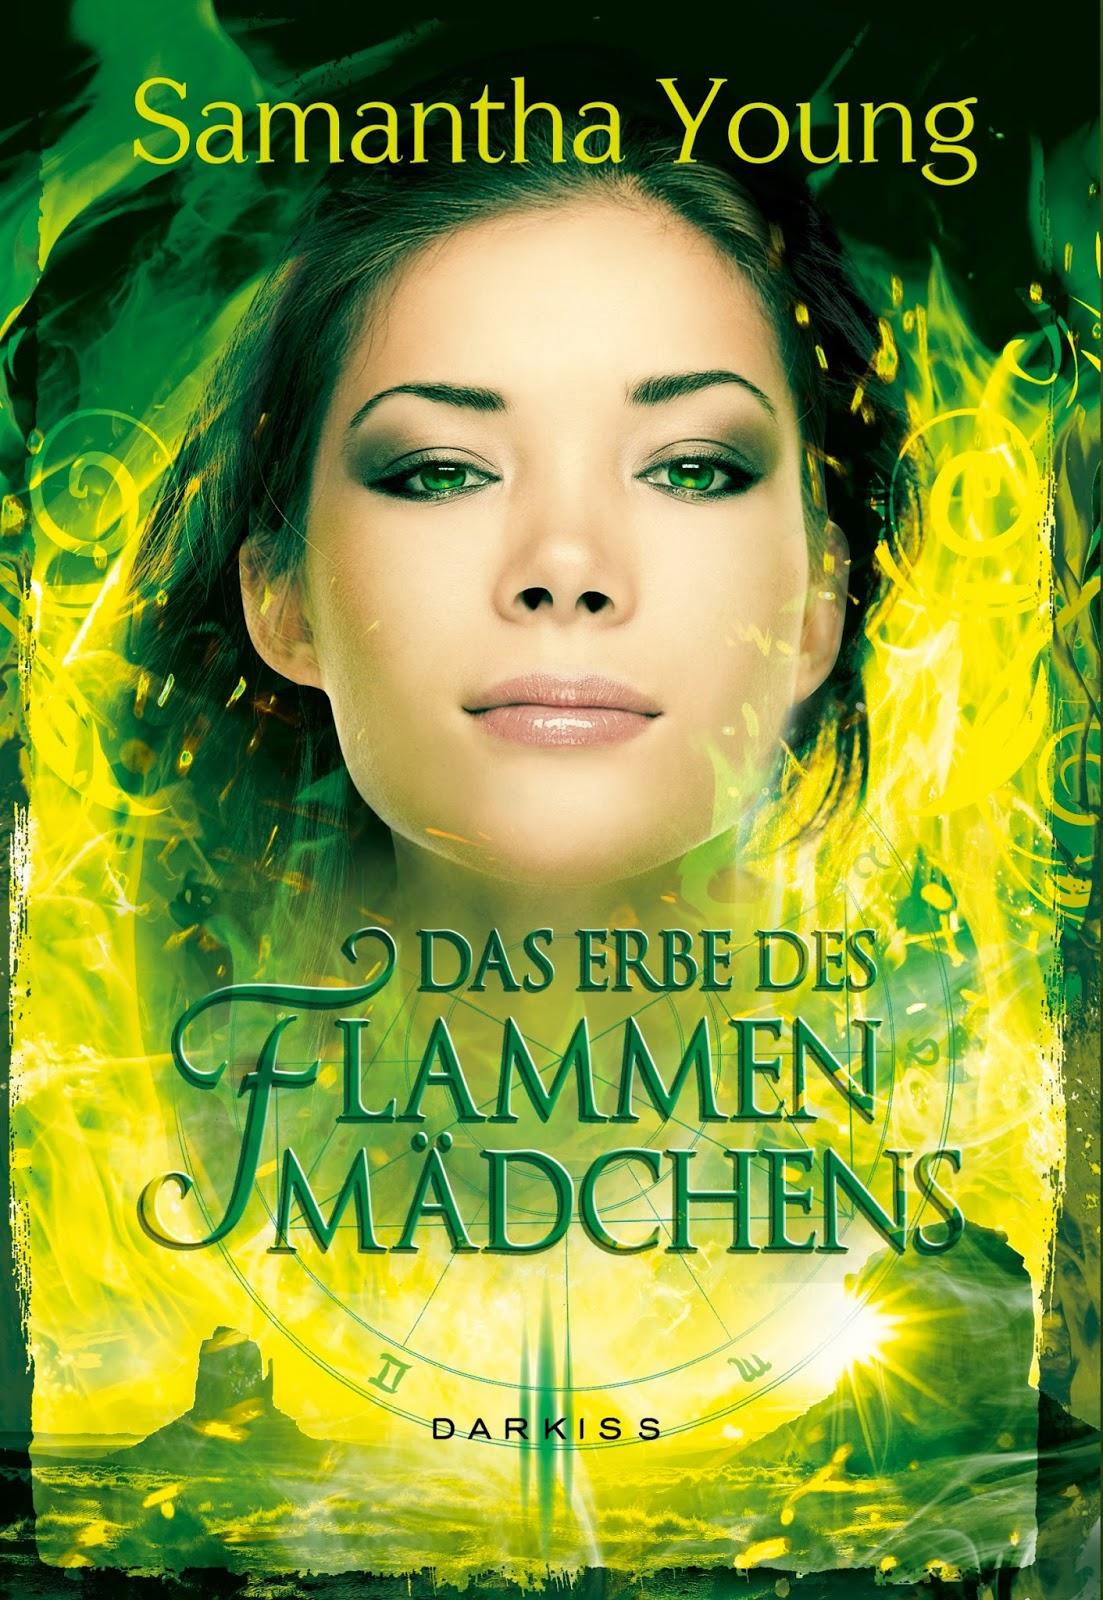 https://www.buchhaus-sternverlag.de/shop/action/productDetails/25282202/samantha_young_das_erbe_des_flammenmaedchens_3956490568.html?aUrl=90007403&searchId=169